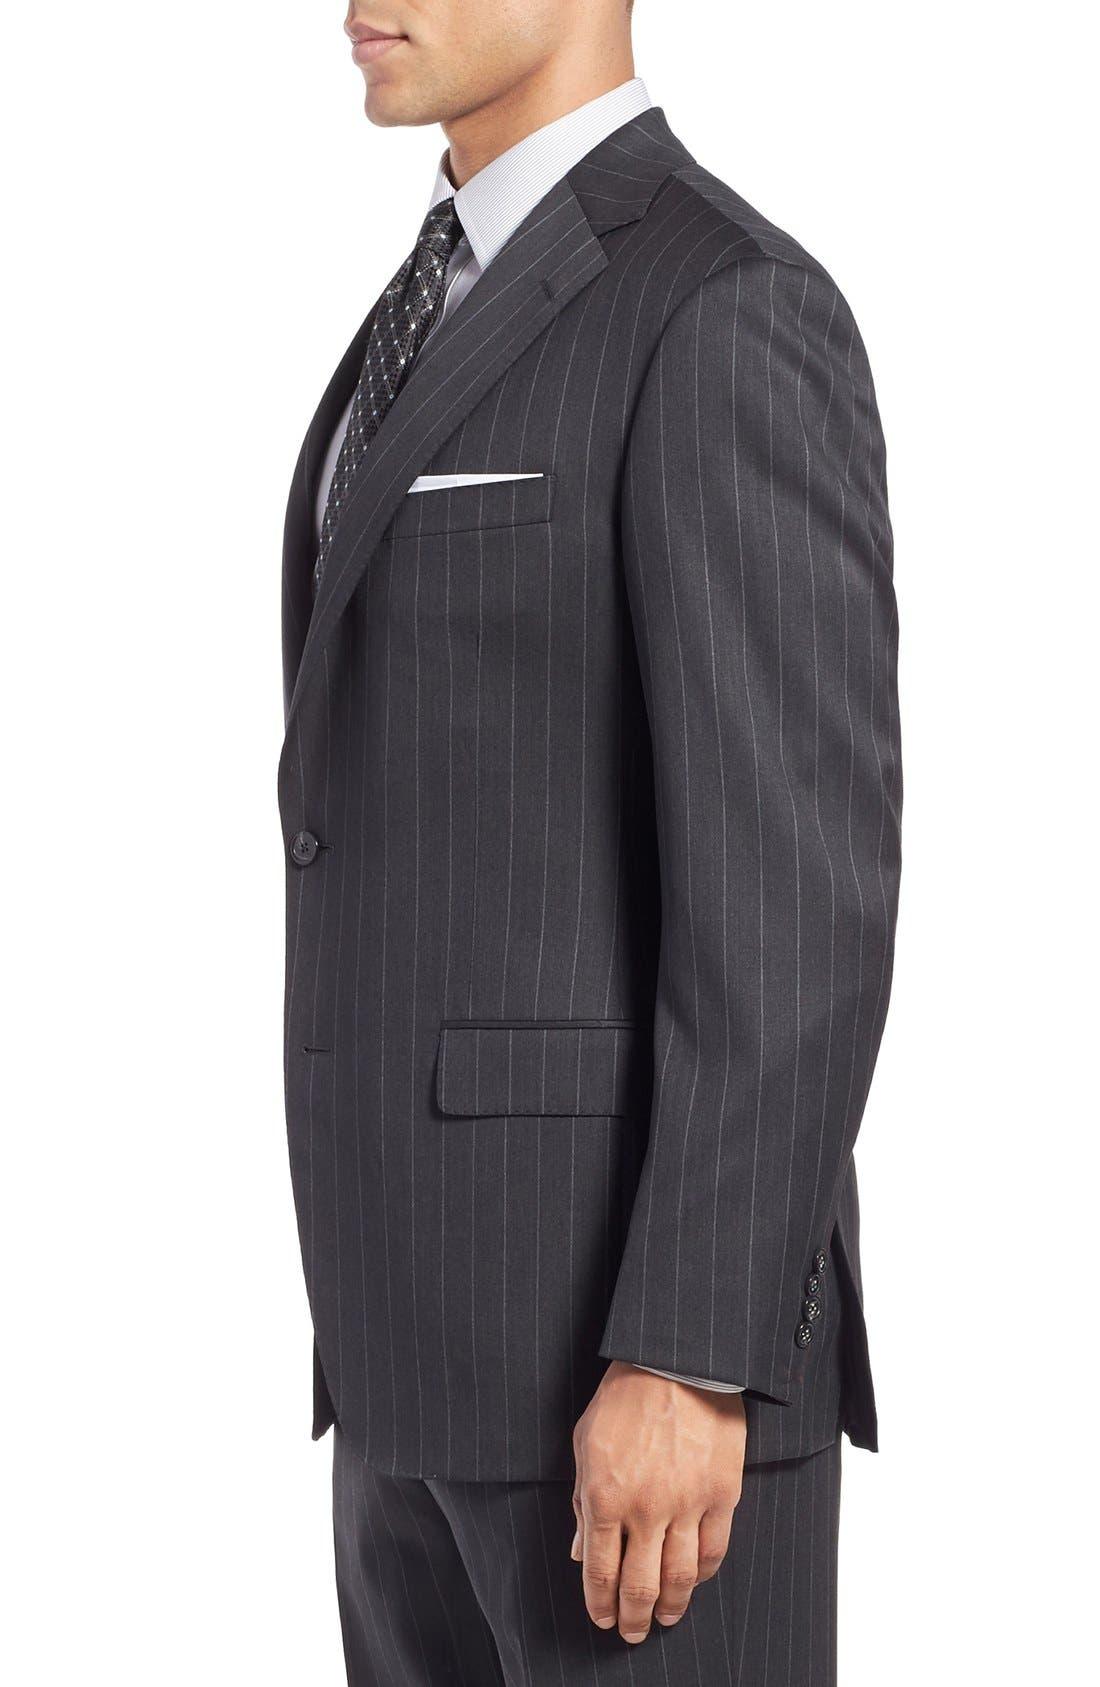 SAMUELSOHN, Classic Fit Stripe Wool Suit, Alternate thumbnail 5, color, 025